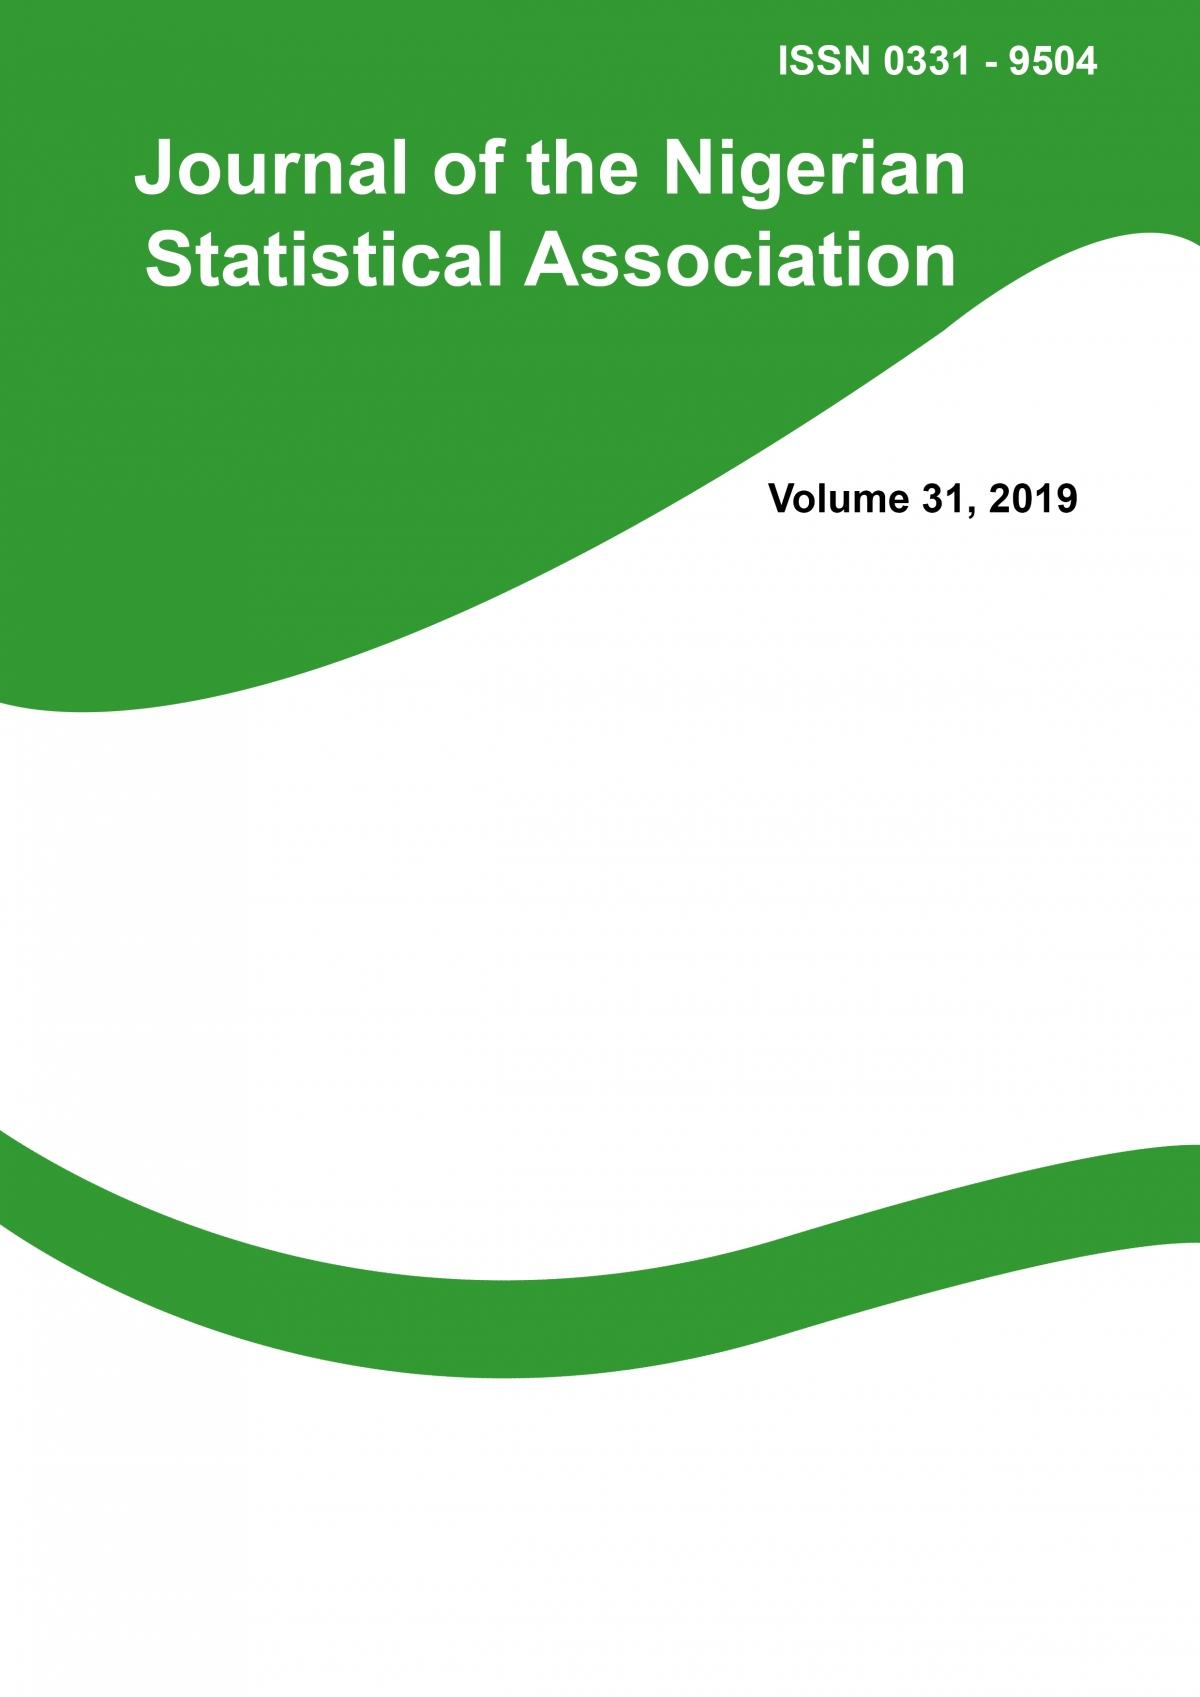 Journal of Nigerian Statistical Association Vol.31 2019